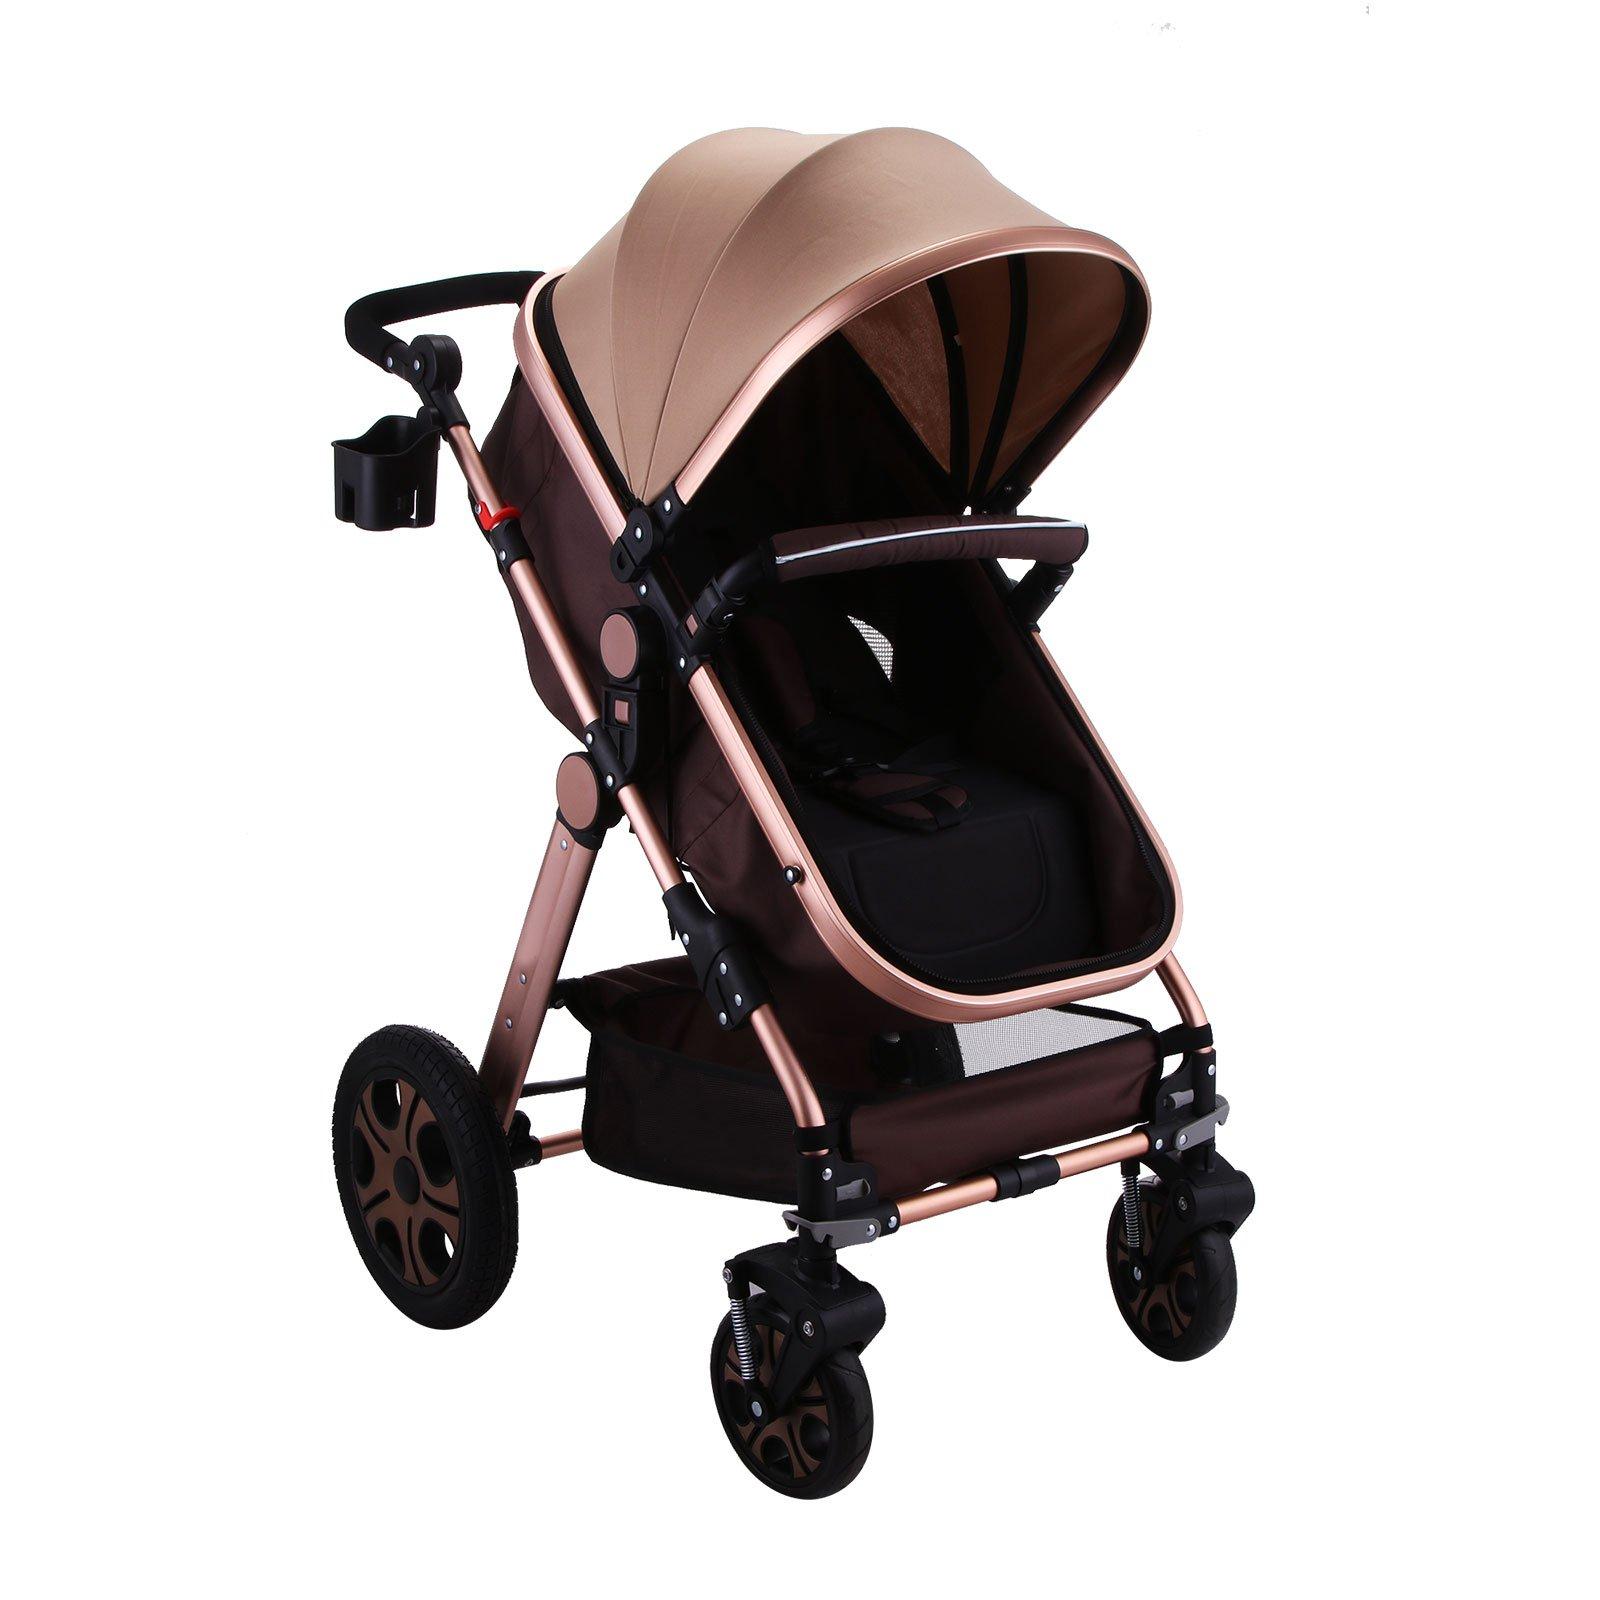 OrangeA Newborn Baby Stroller Foldable Anti-shock High View Carriage Infant Stroller Pushchair Pram (Gold)